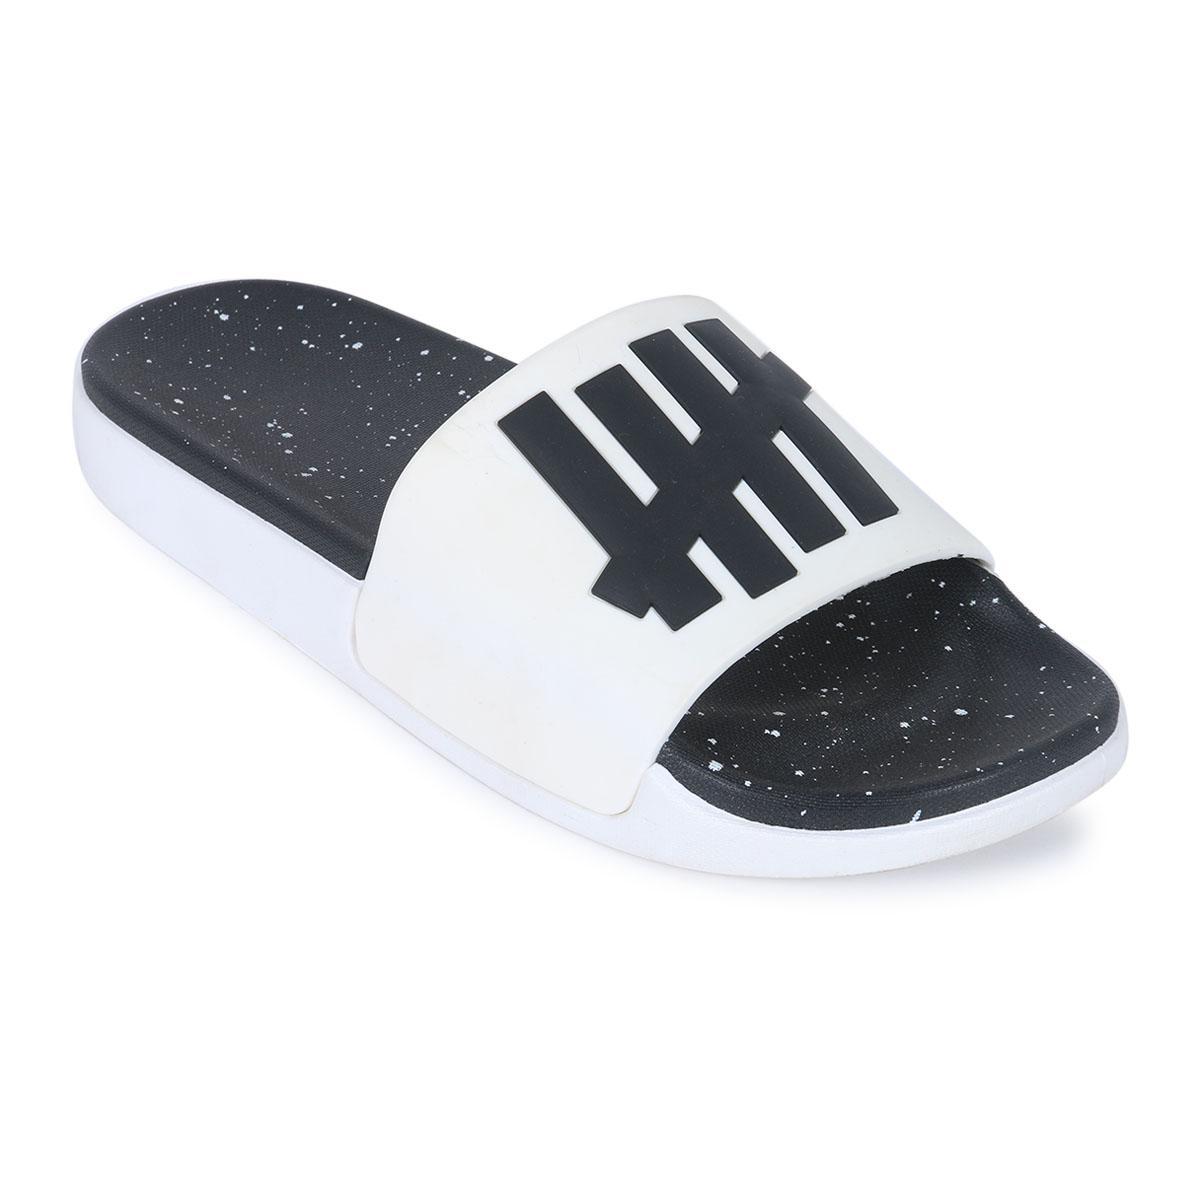 64ca8b57aea237 Men s Shoes Online - Buy Shoes For Men in Bangladesh - Daraz.com.bd